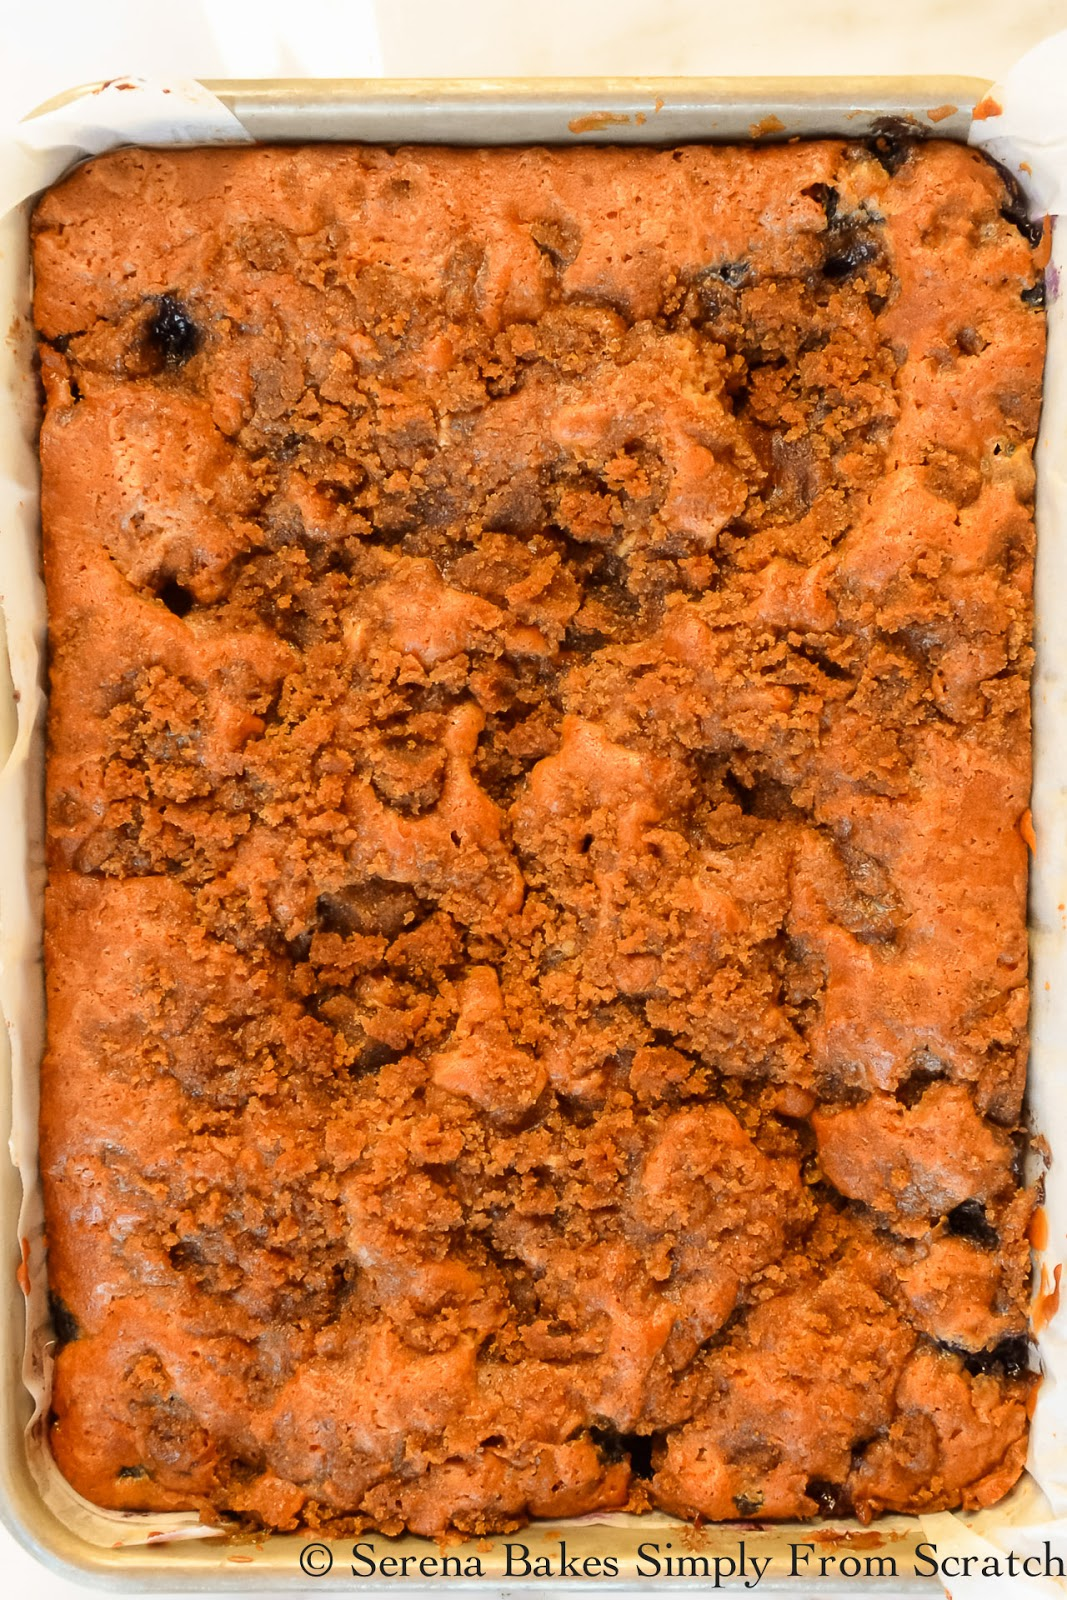 Blueberry Coffee Cake Cinnamon Swirl Brown Sugar Crumb Baked